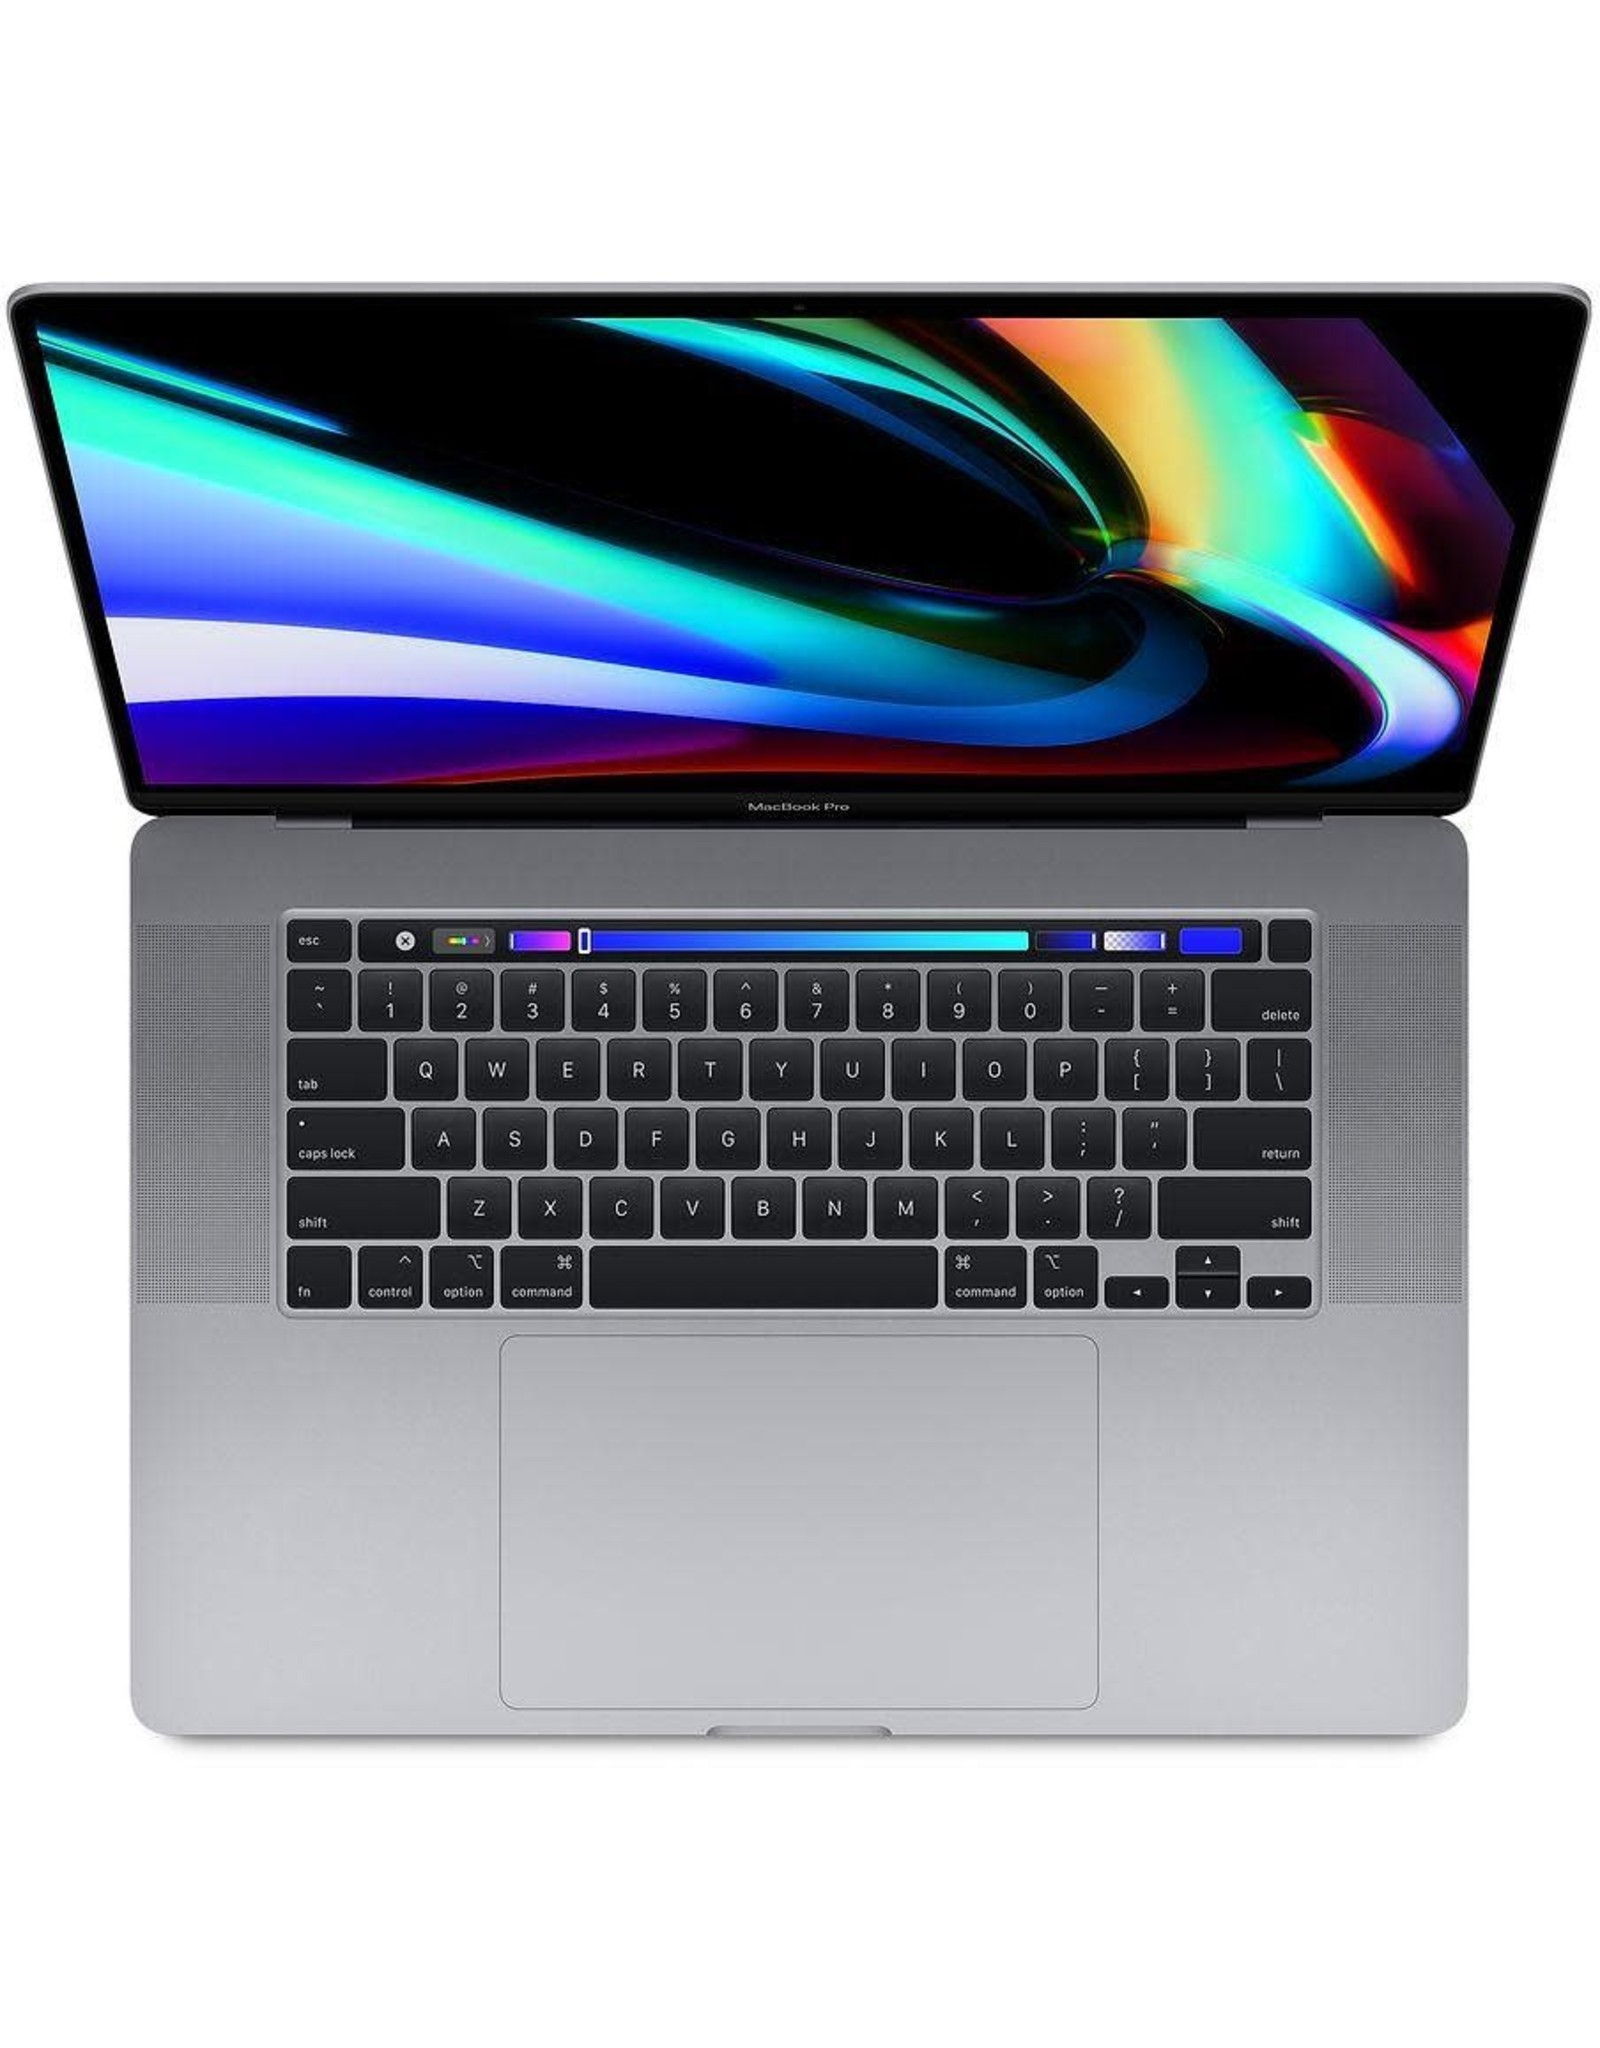 Apple Apple 16-inch MacBook Pro 512GB 2.6GHz 6-core i7 16GB RAM Radeon Pro 5300M 4GB